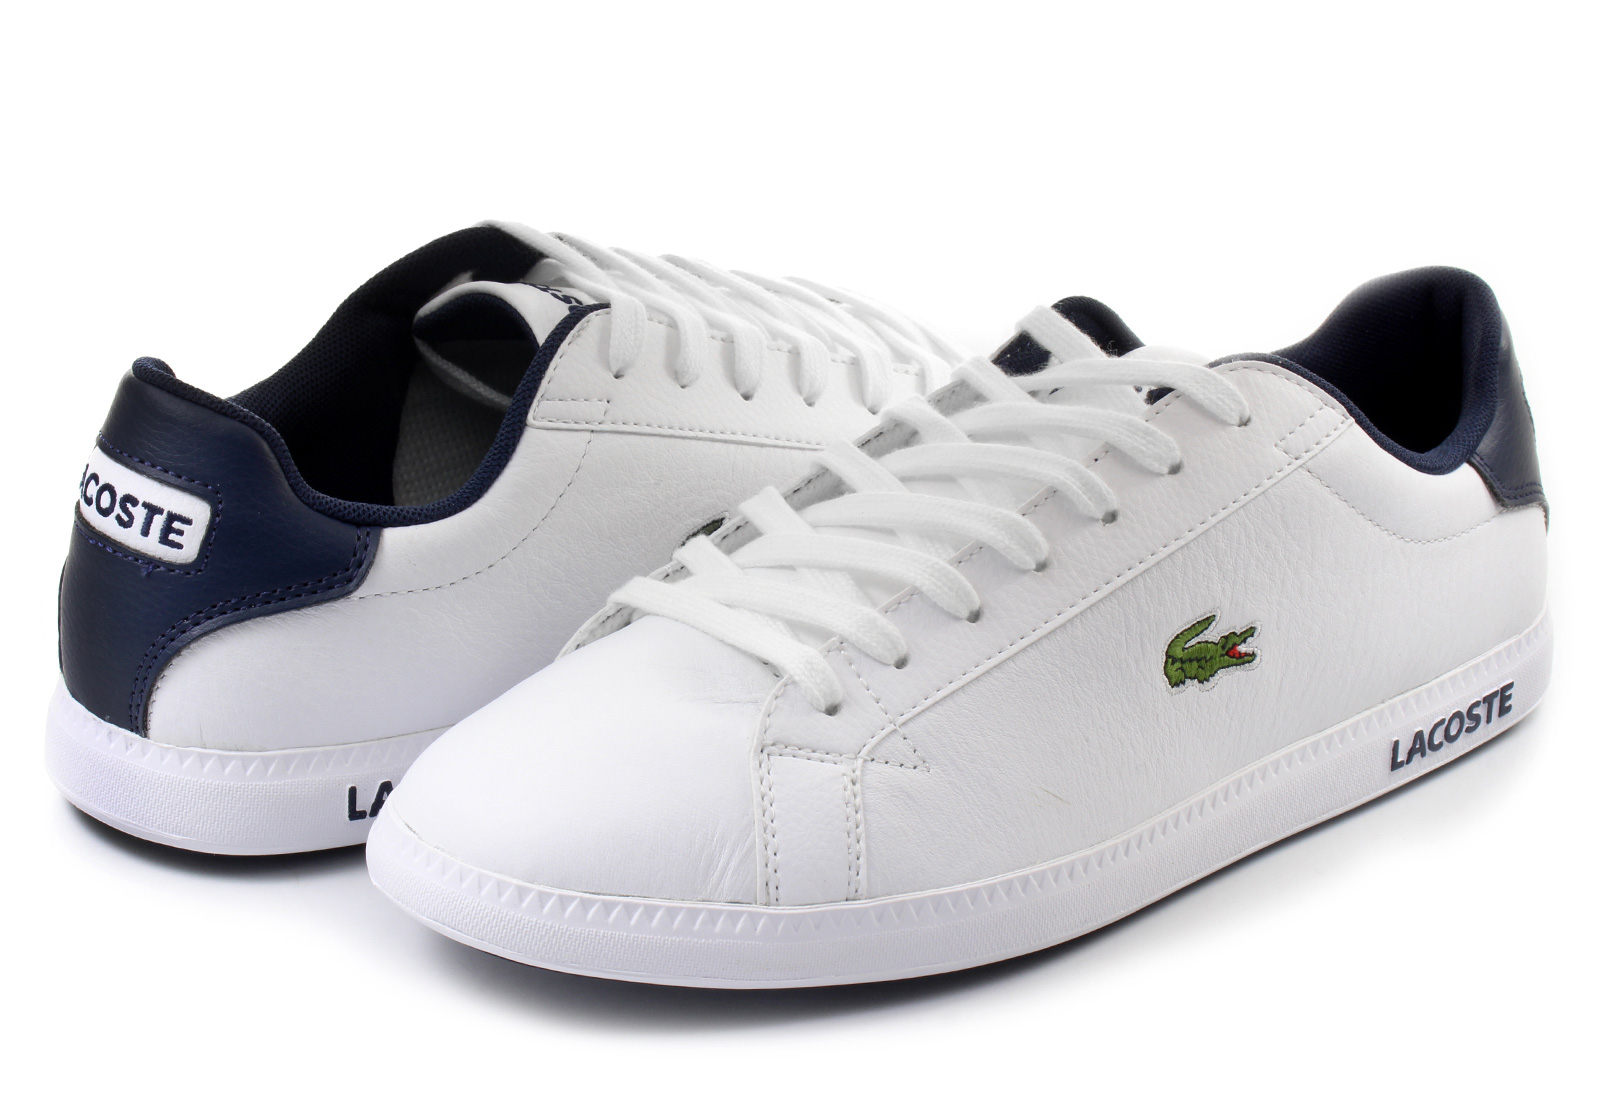 Hunter Brand Shoes